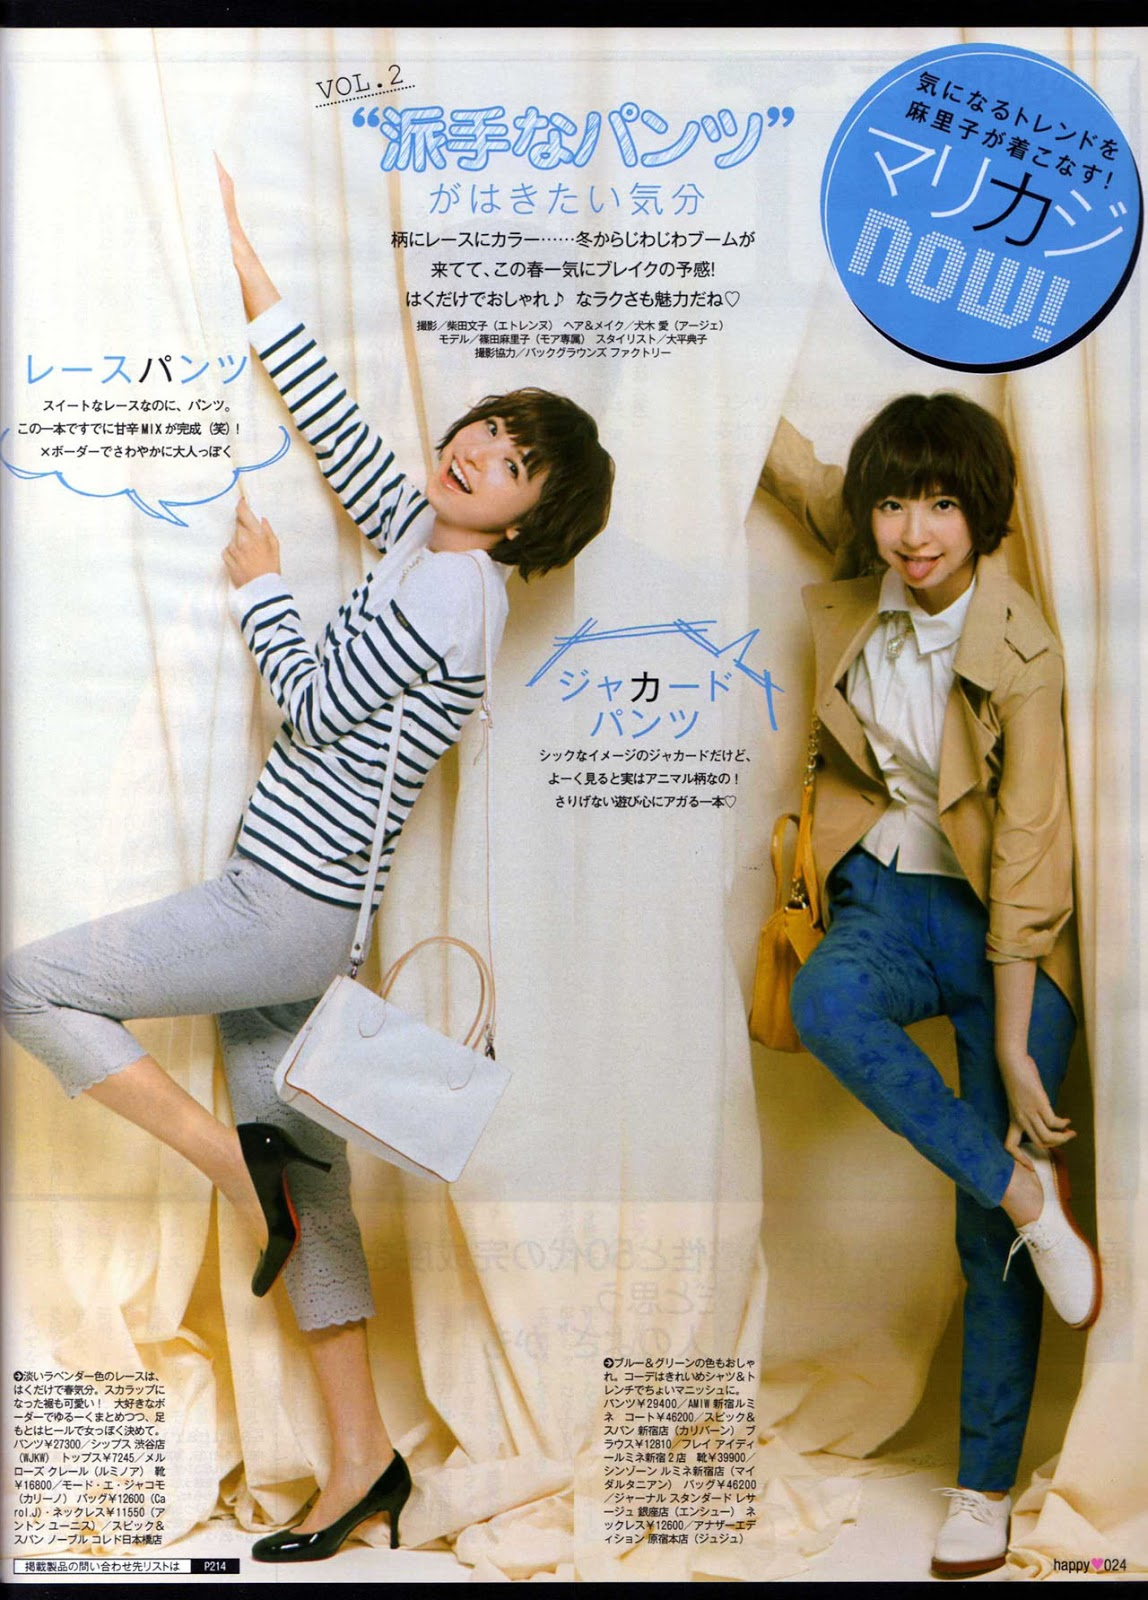 More Magazine November 2014 Issue: Photos Videos News: AKB48 Mariko Shinoda